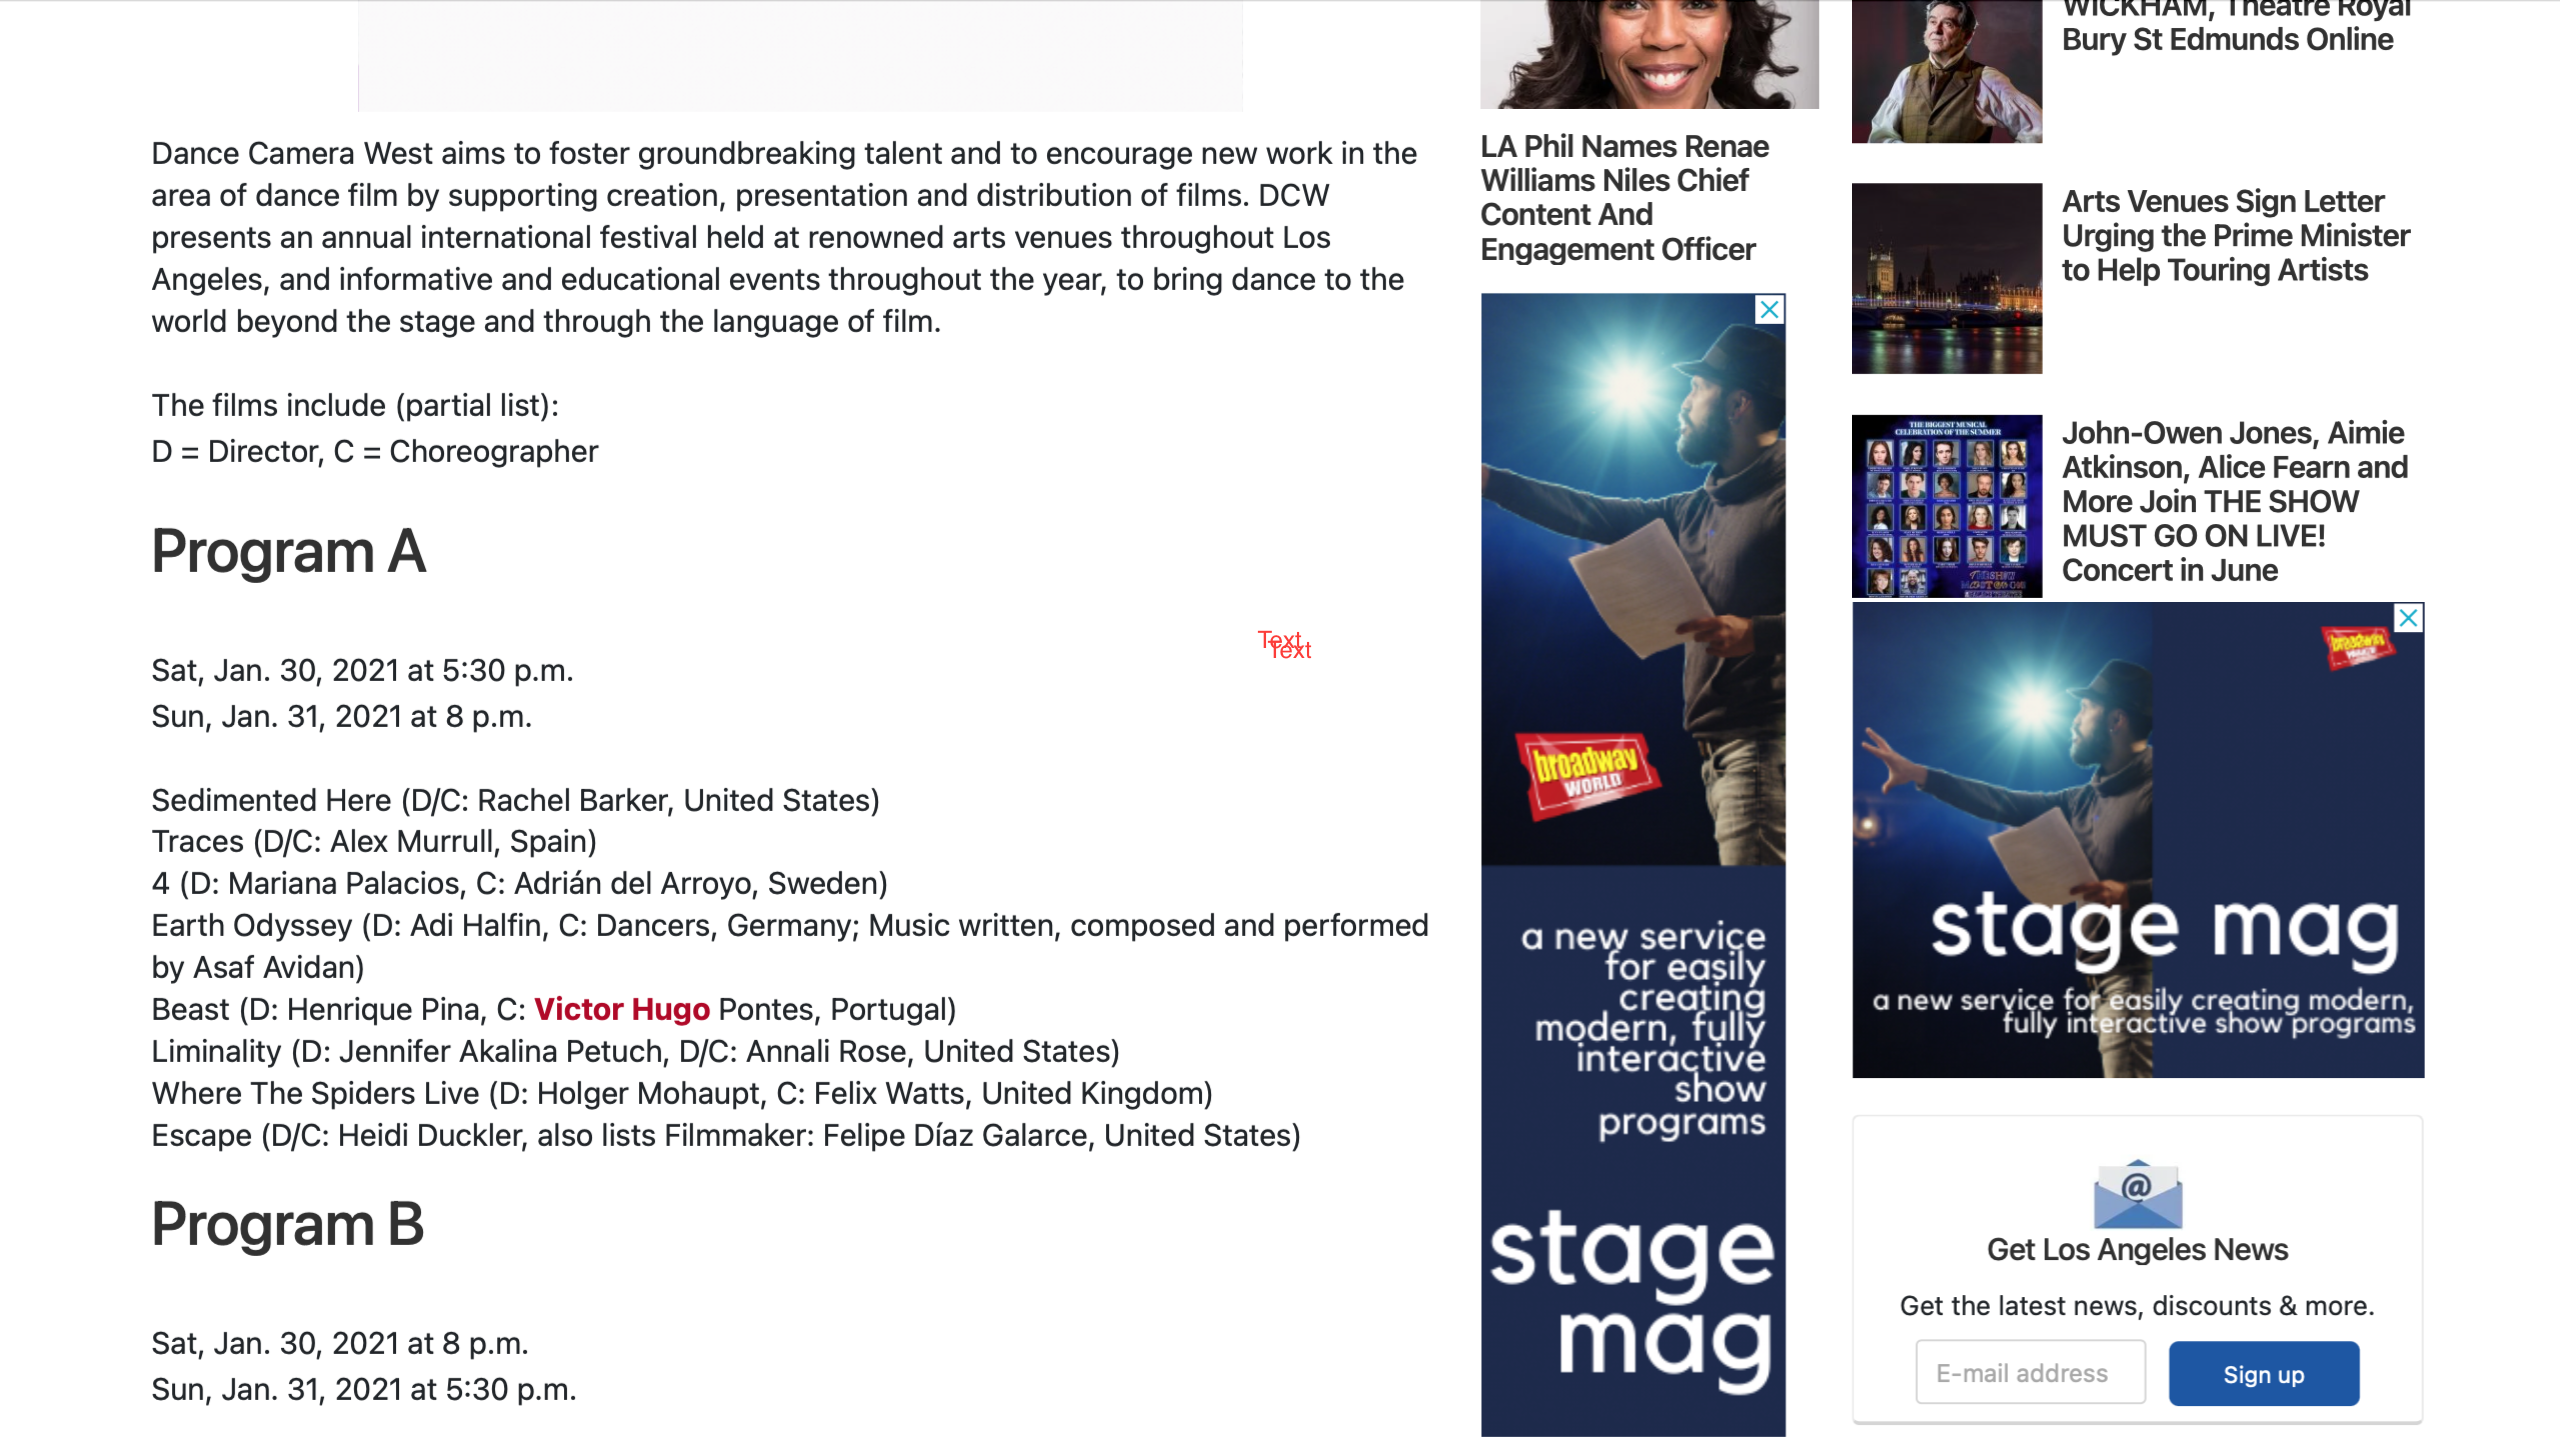 Broadway Programme Screenshot 2021-05-02 at 19.31.09